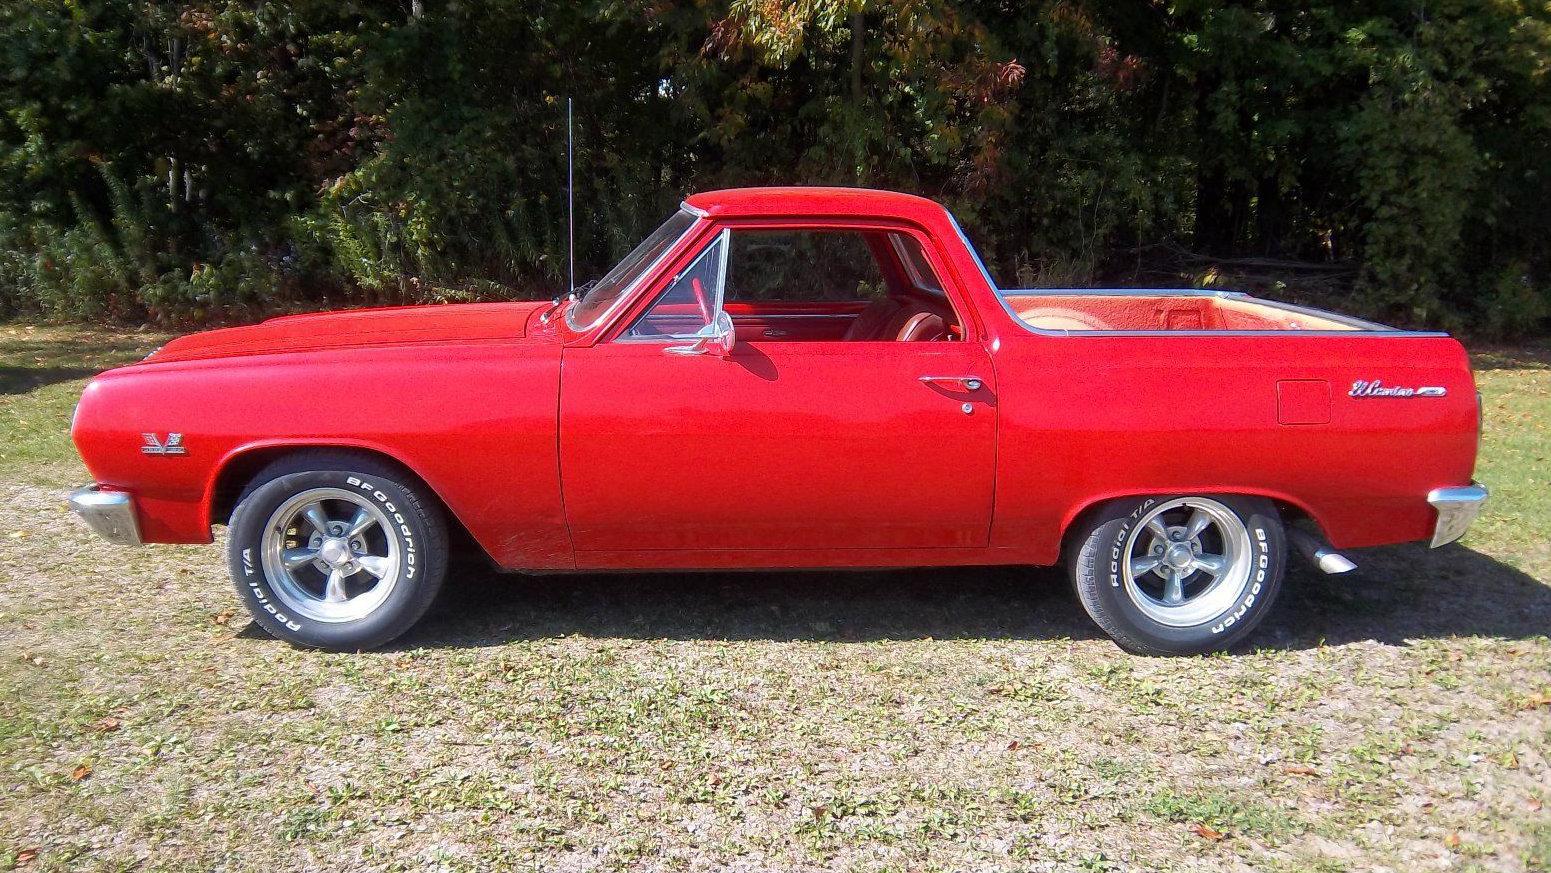 Short Bed Truck >> Abbreviated! Shorty 1965 El Camino